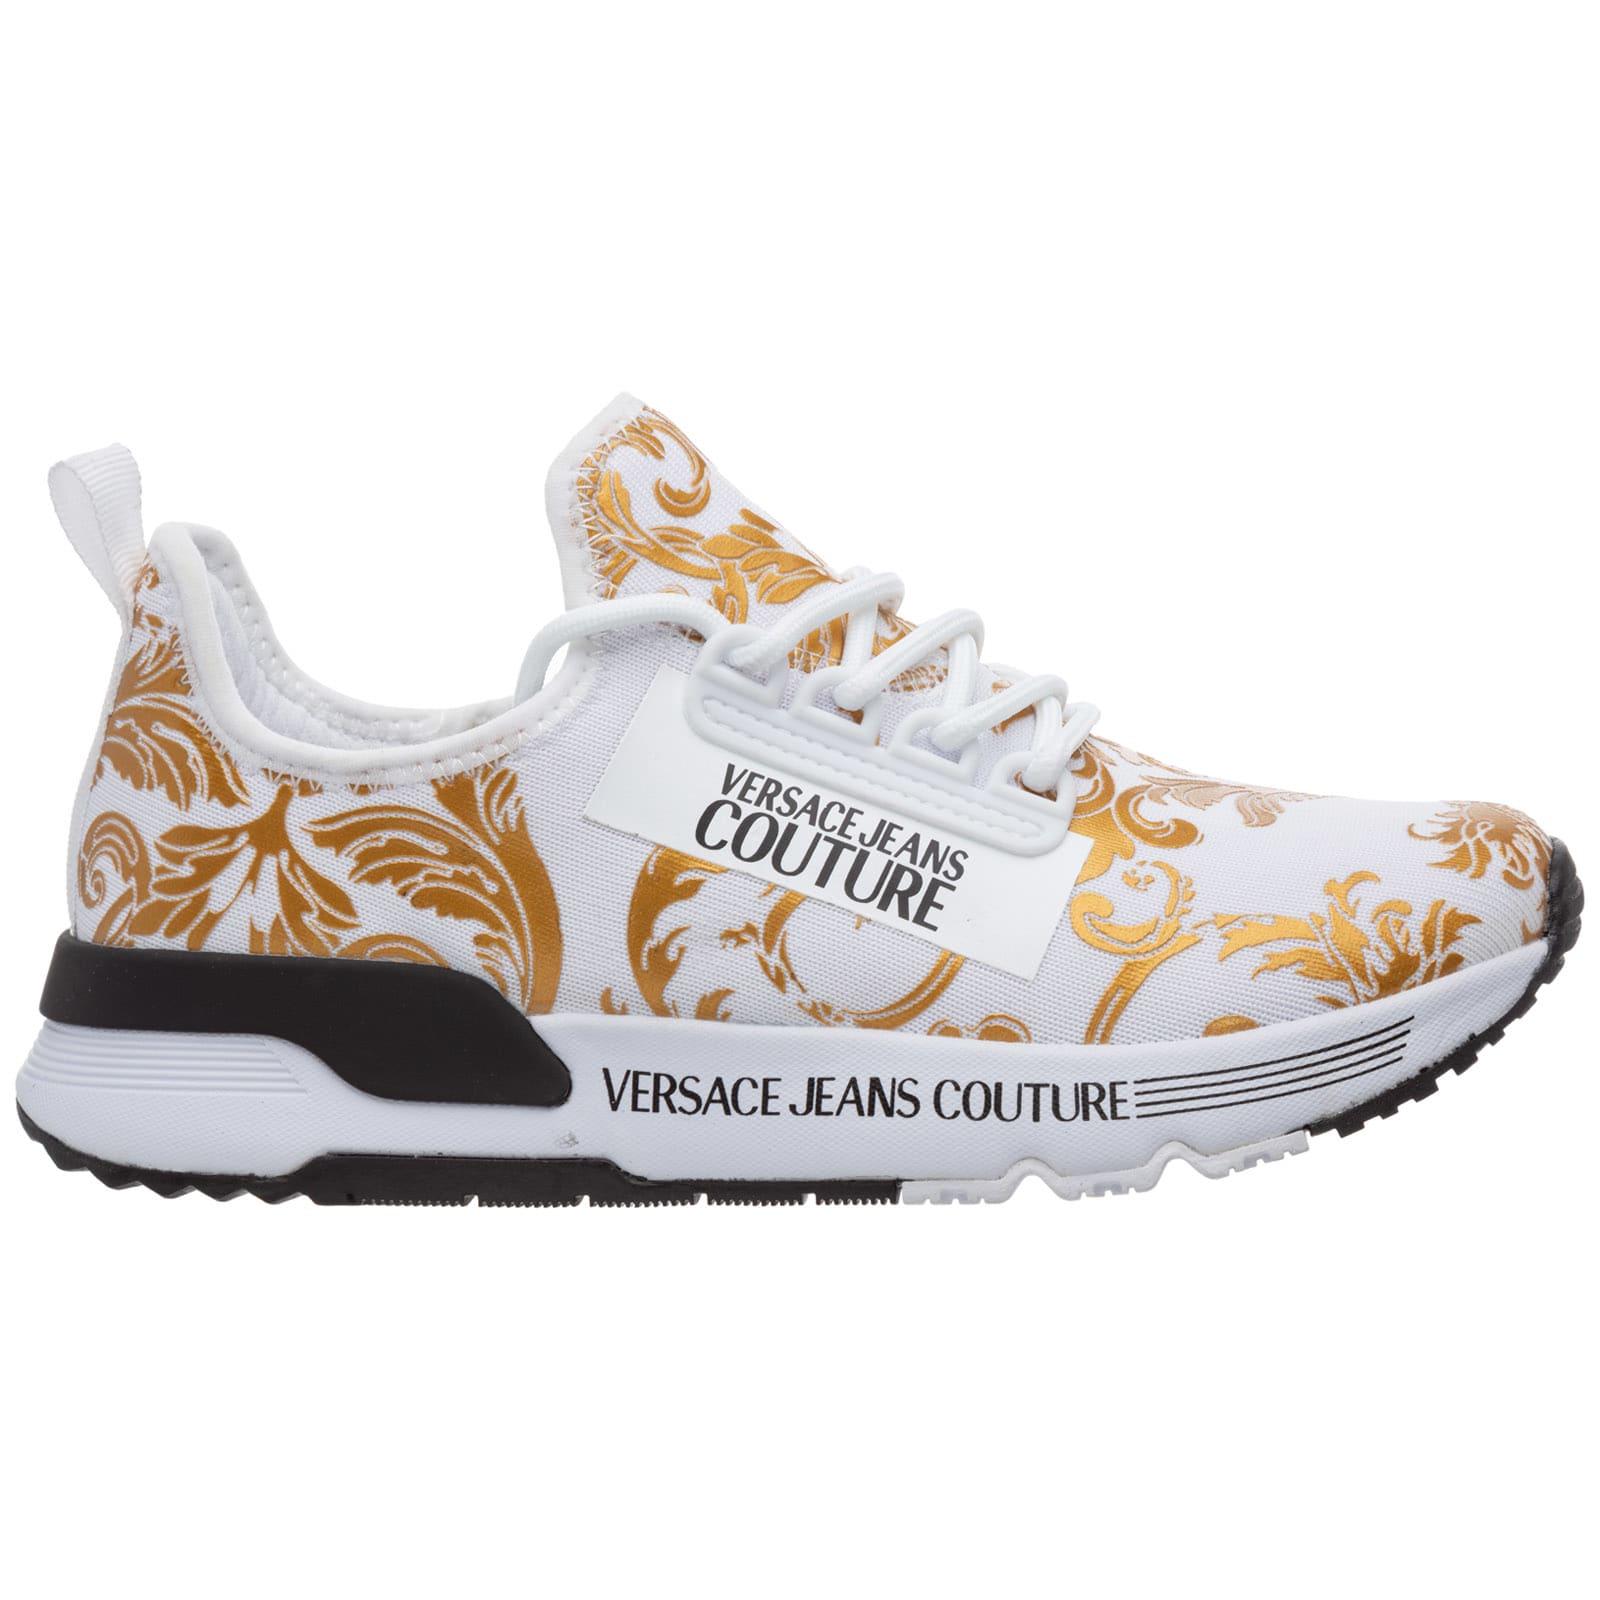 Versace Jeans Couture Sneakers FONDO AERODYNAMIC SNEAKERS